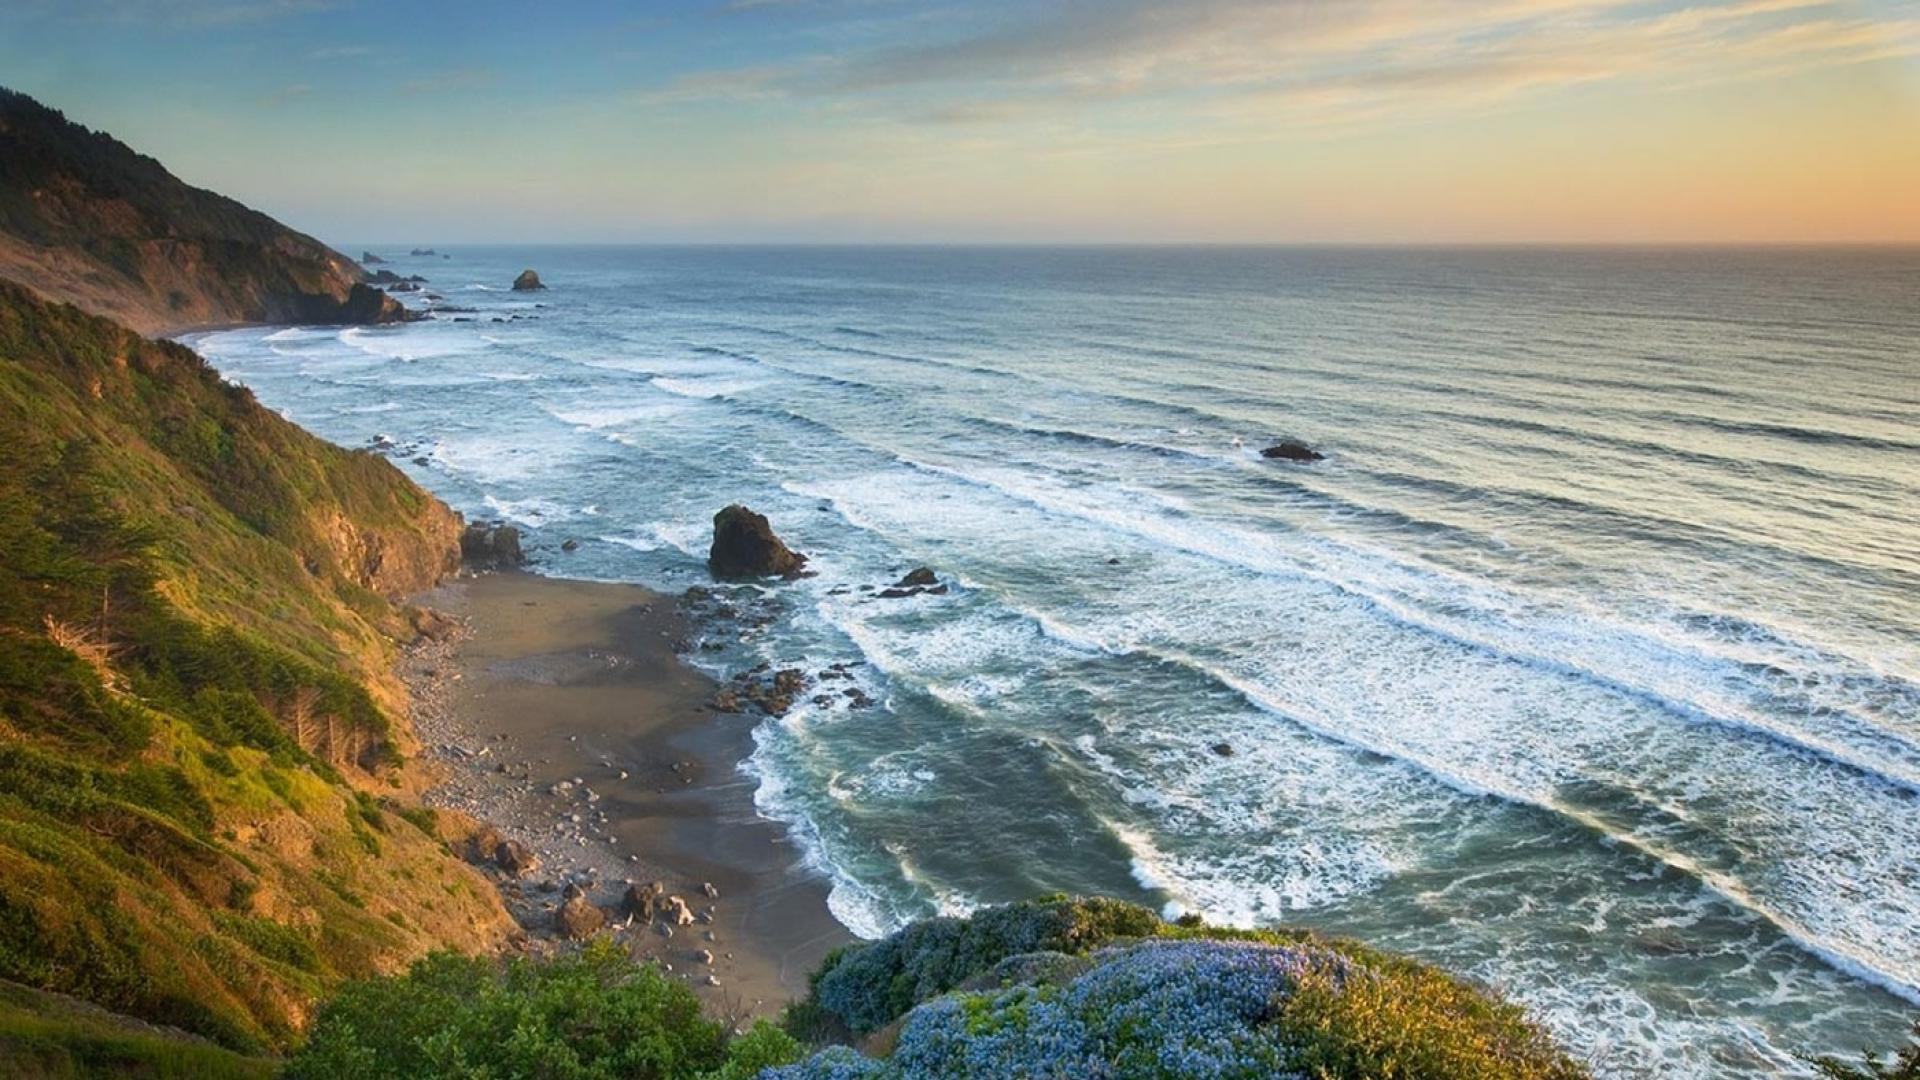 california west coast wallpaper - photo #2